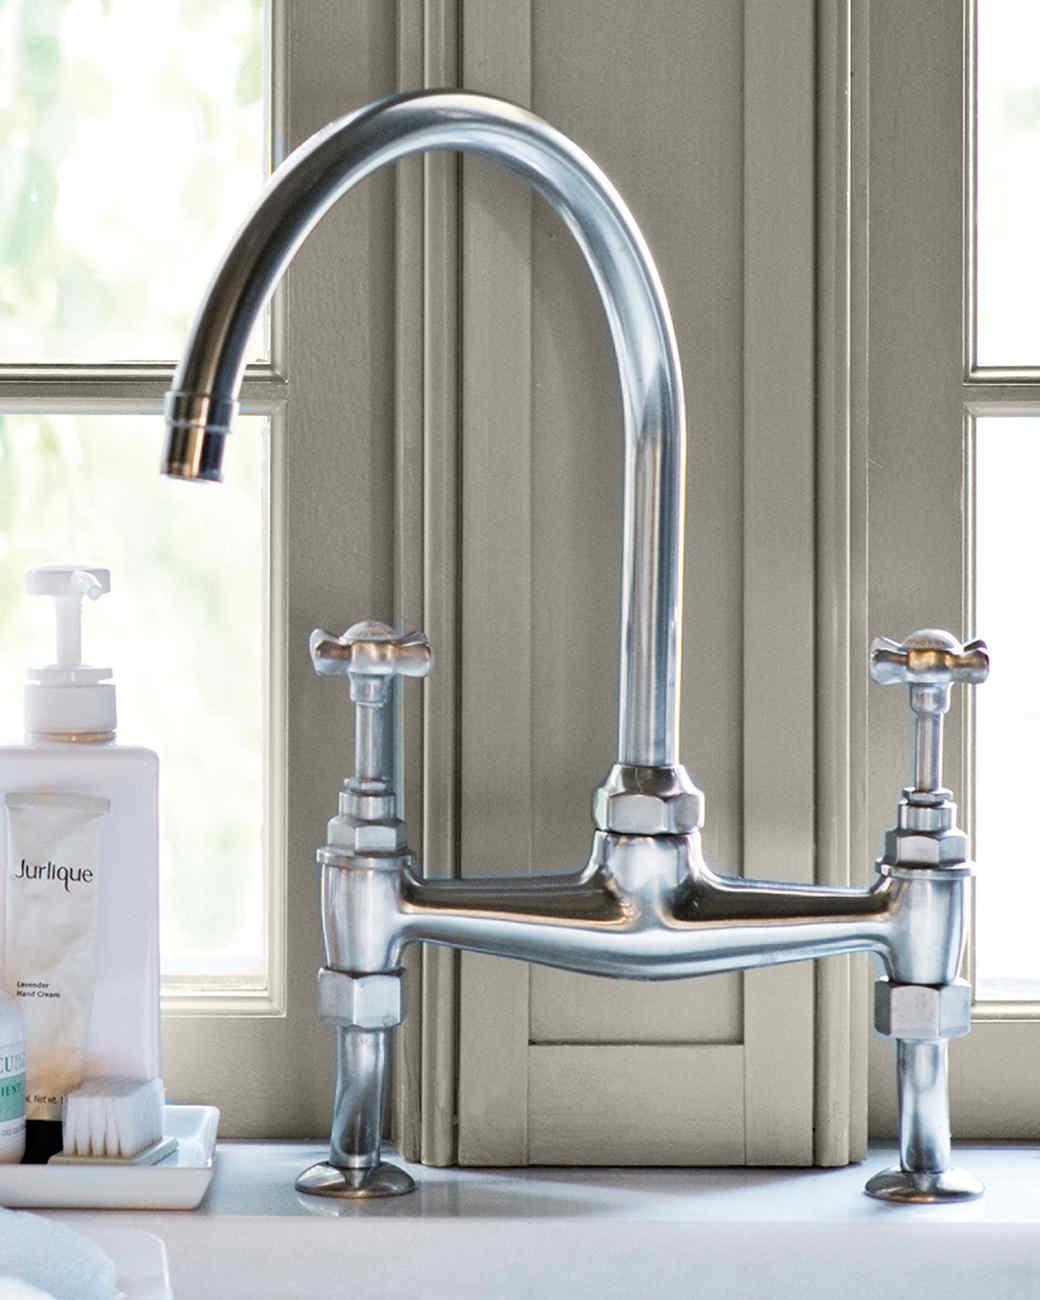 md106031_0910_sink_faucet.jpg